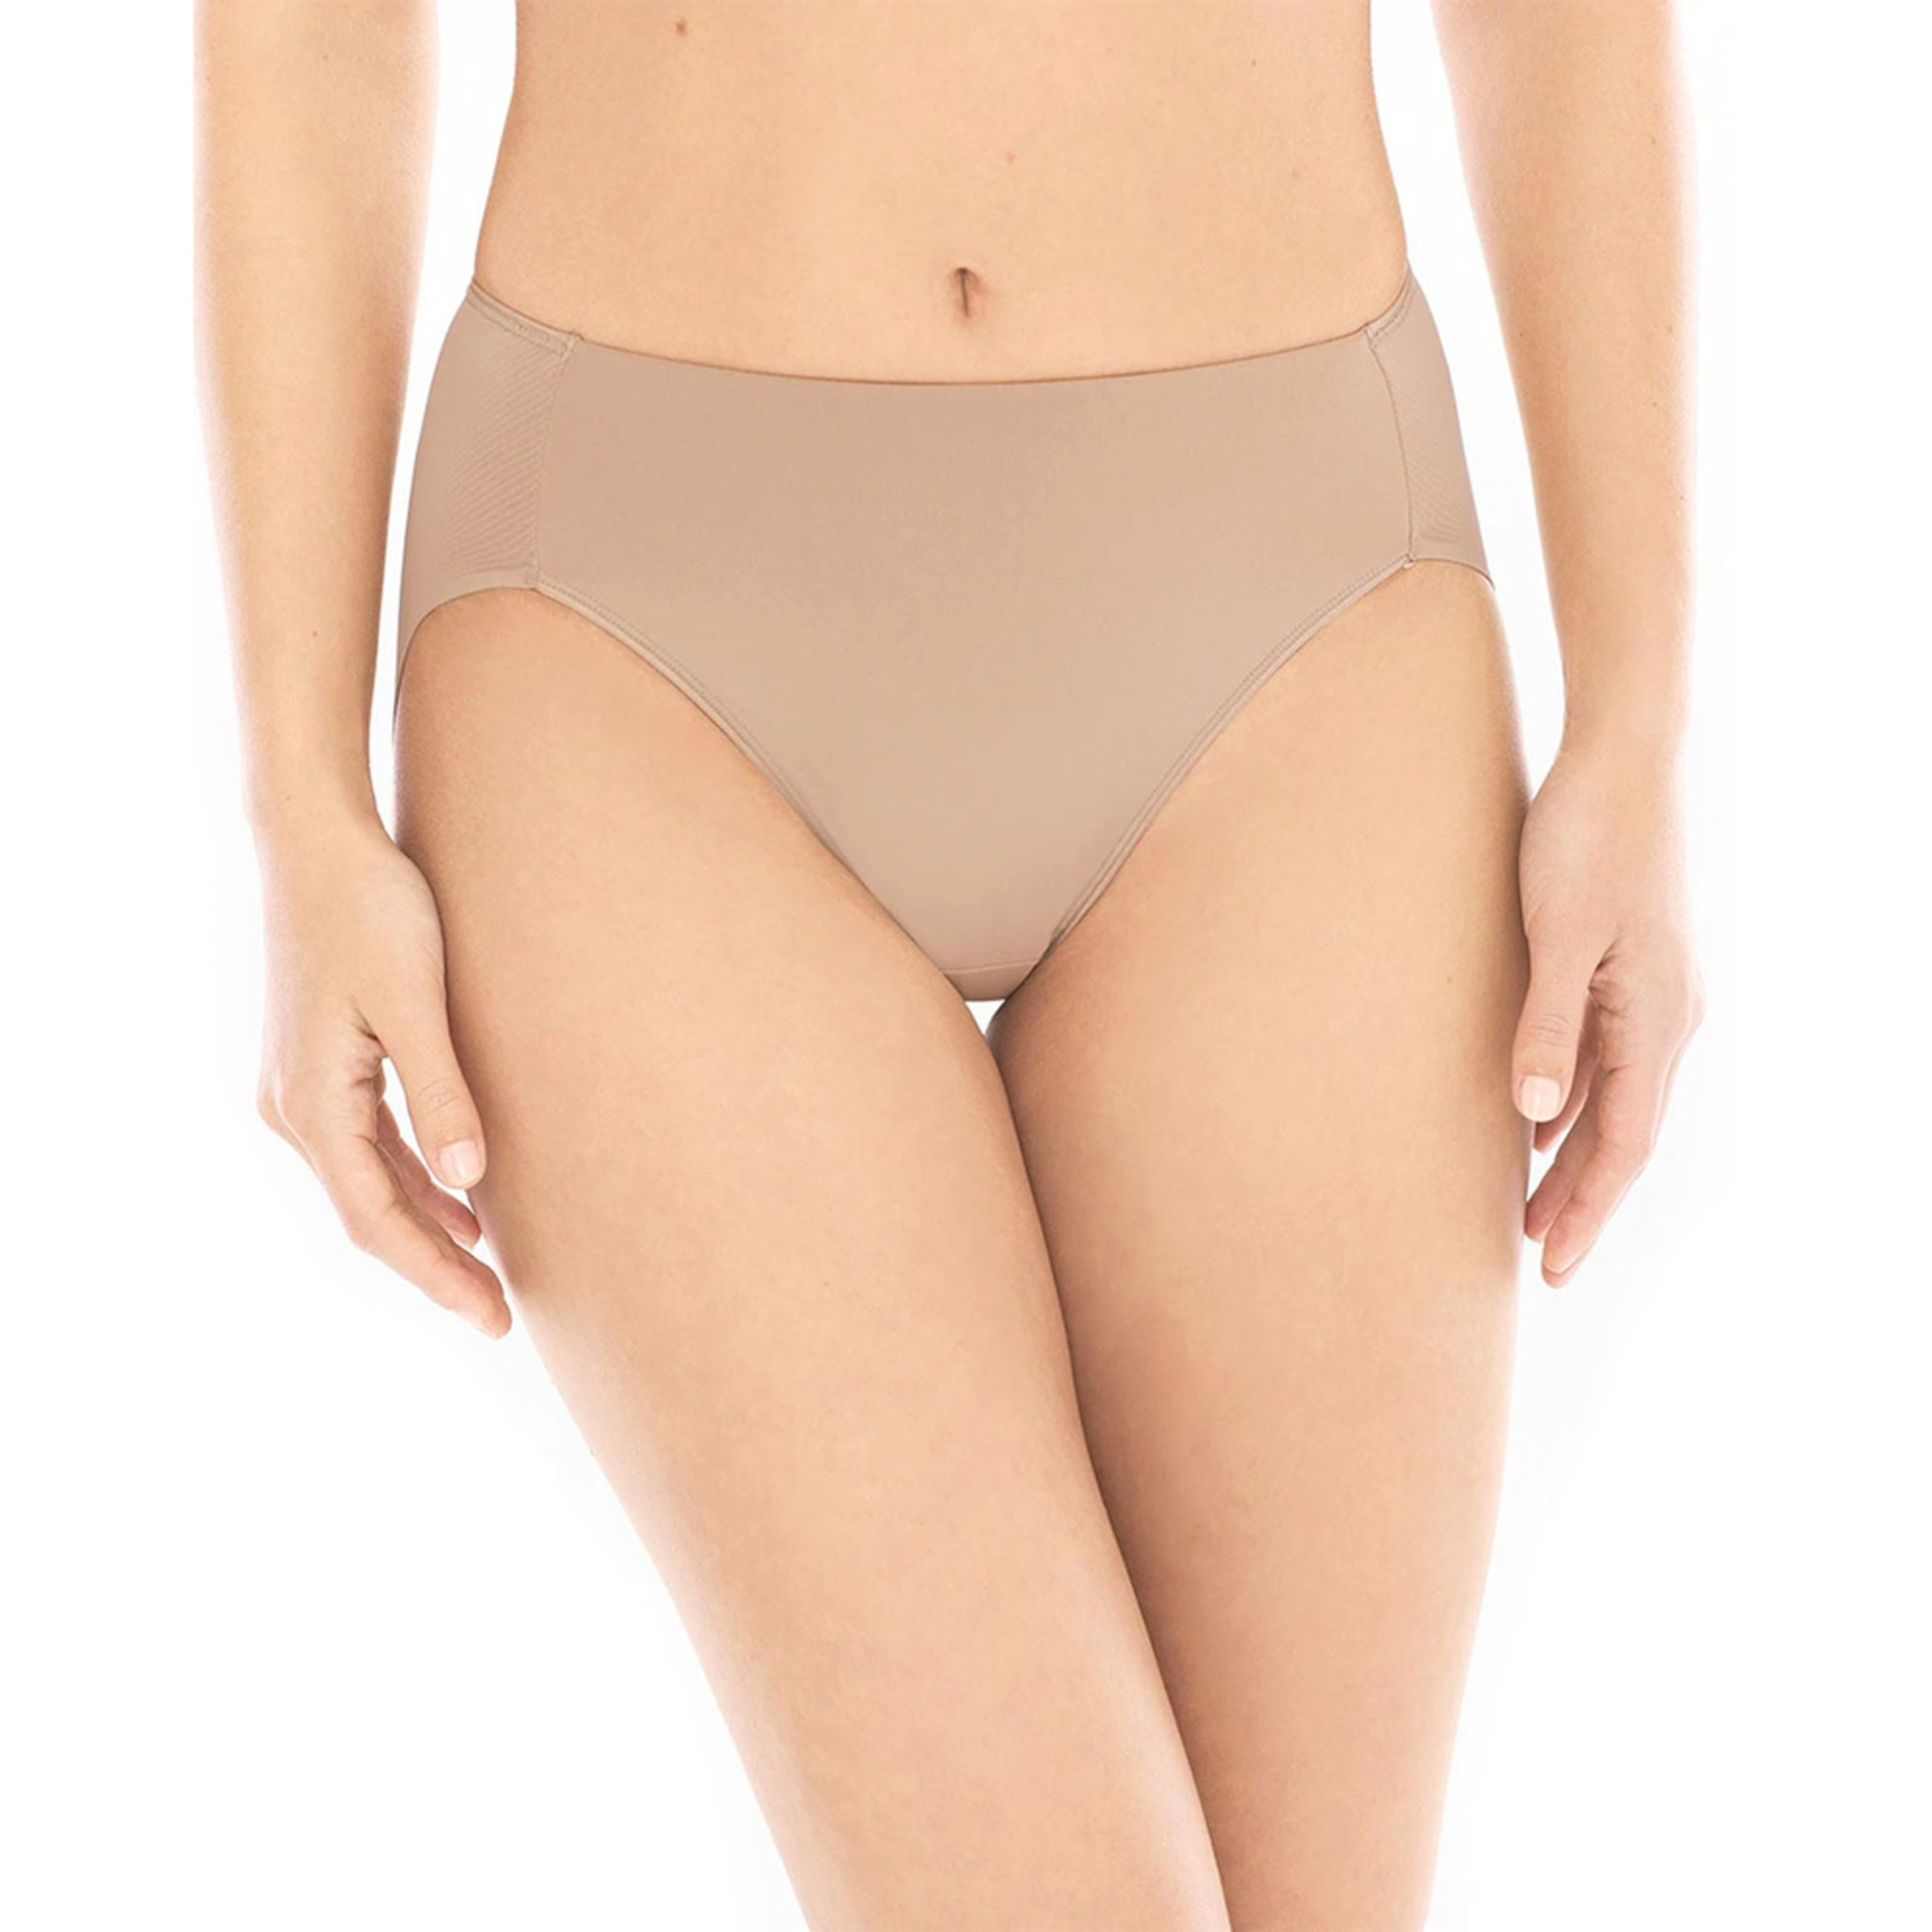 cd8fcd93beff Soma Women's Vanishing Tummy High Leg Brief | Hi-cut Panties ...